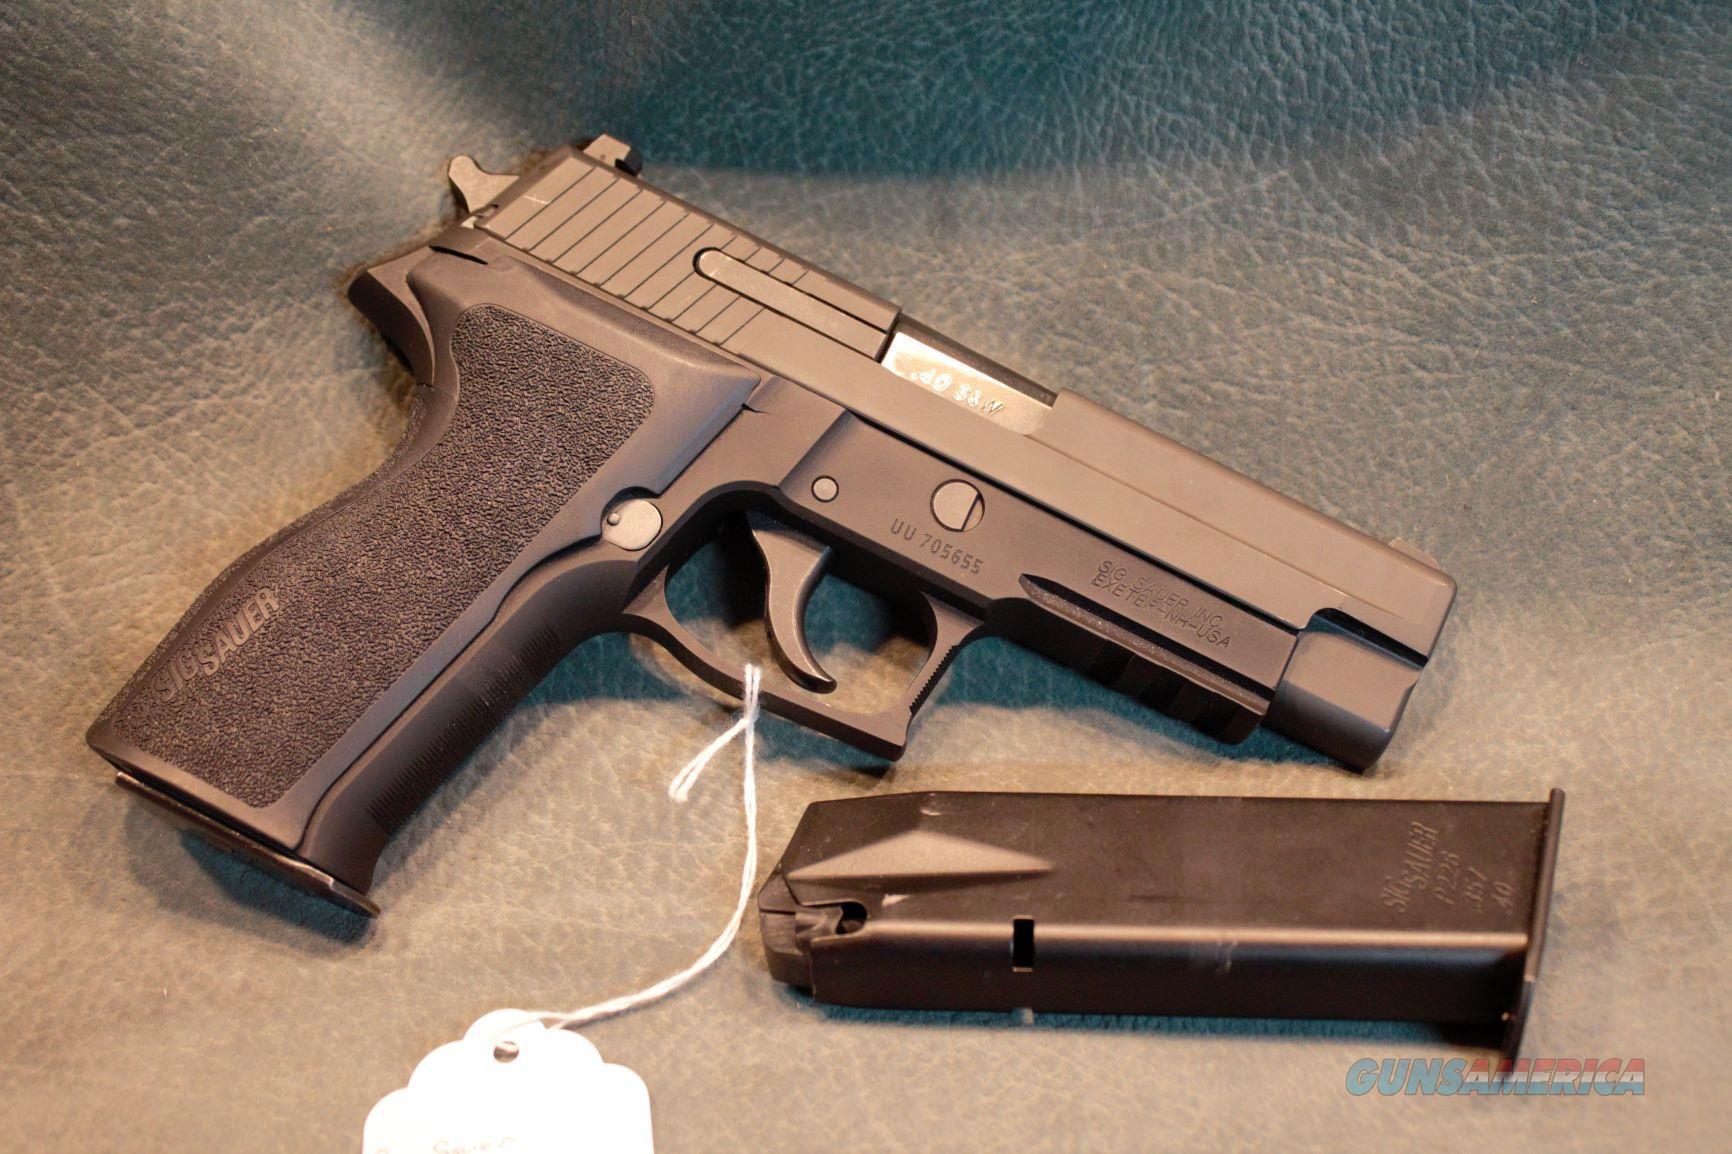 Sig Sauer P226 40 S&W  Guns > Pistols > Sig - Sauer/Sigarms Pistols > P226